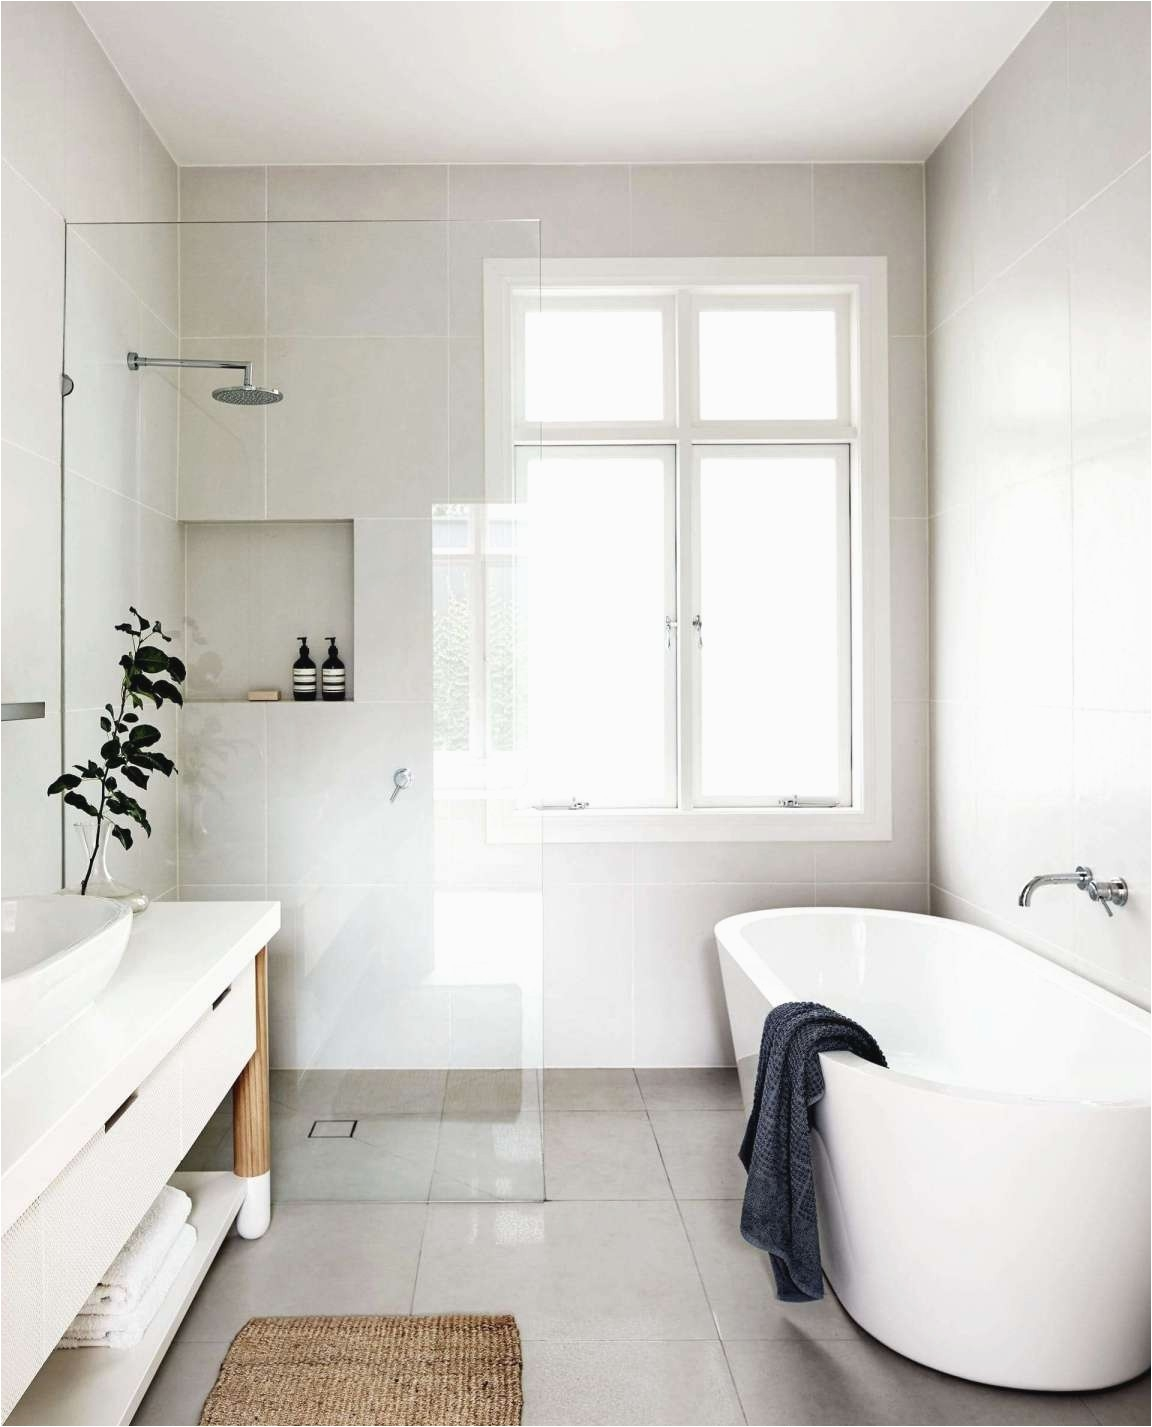 Interior Design Ideas Bathroom Colors Interior Design Ideas Bathroom Colors Fresh Stunning Elegant Small